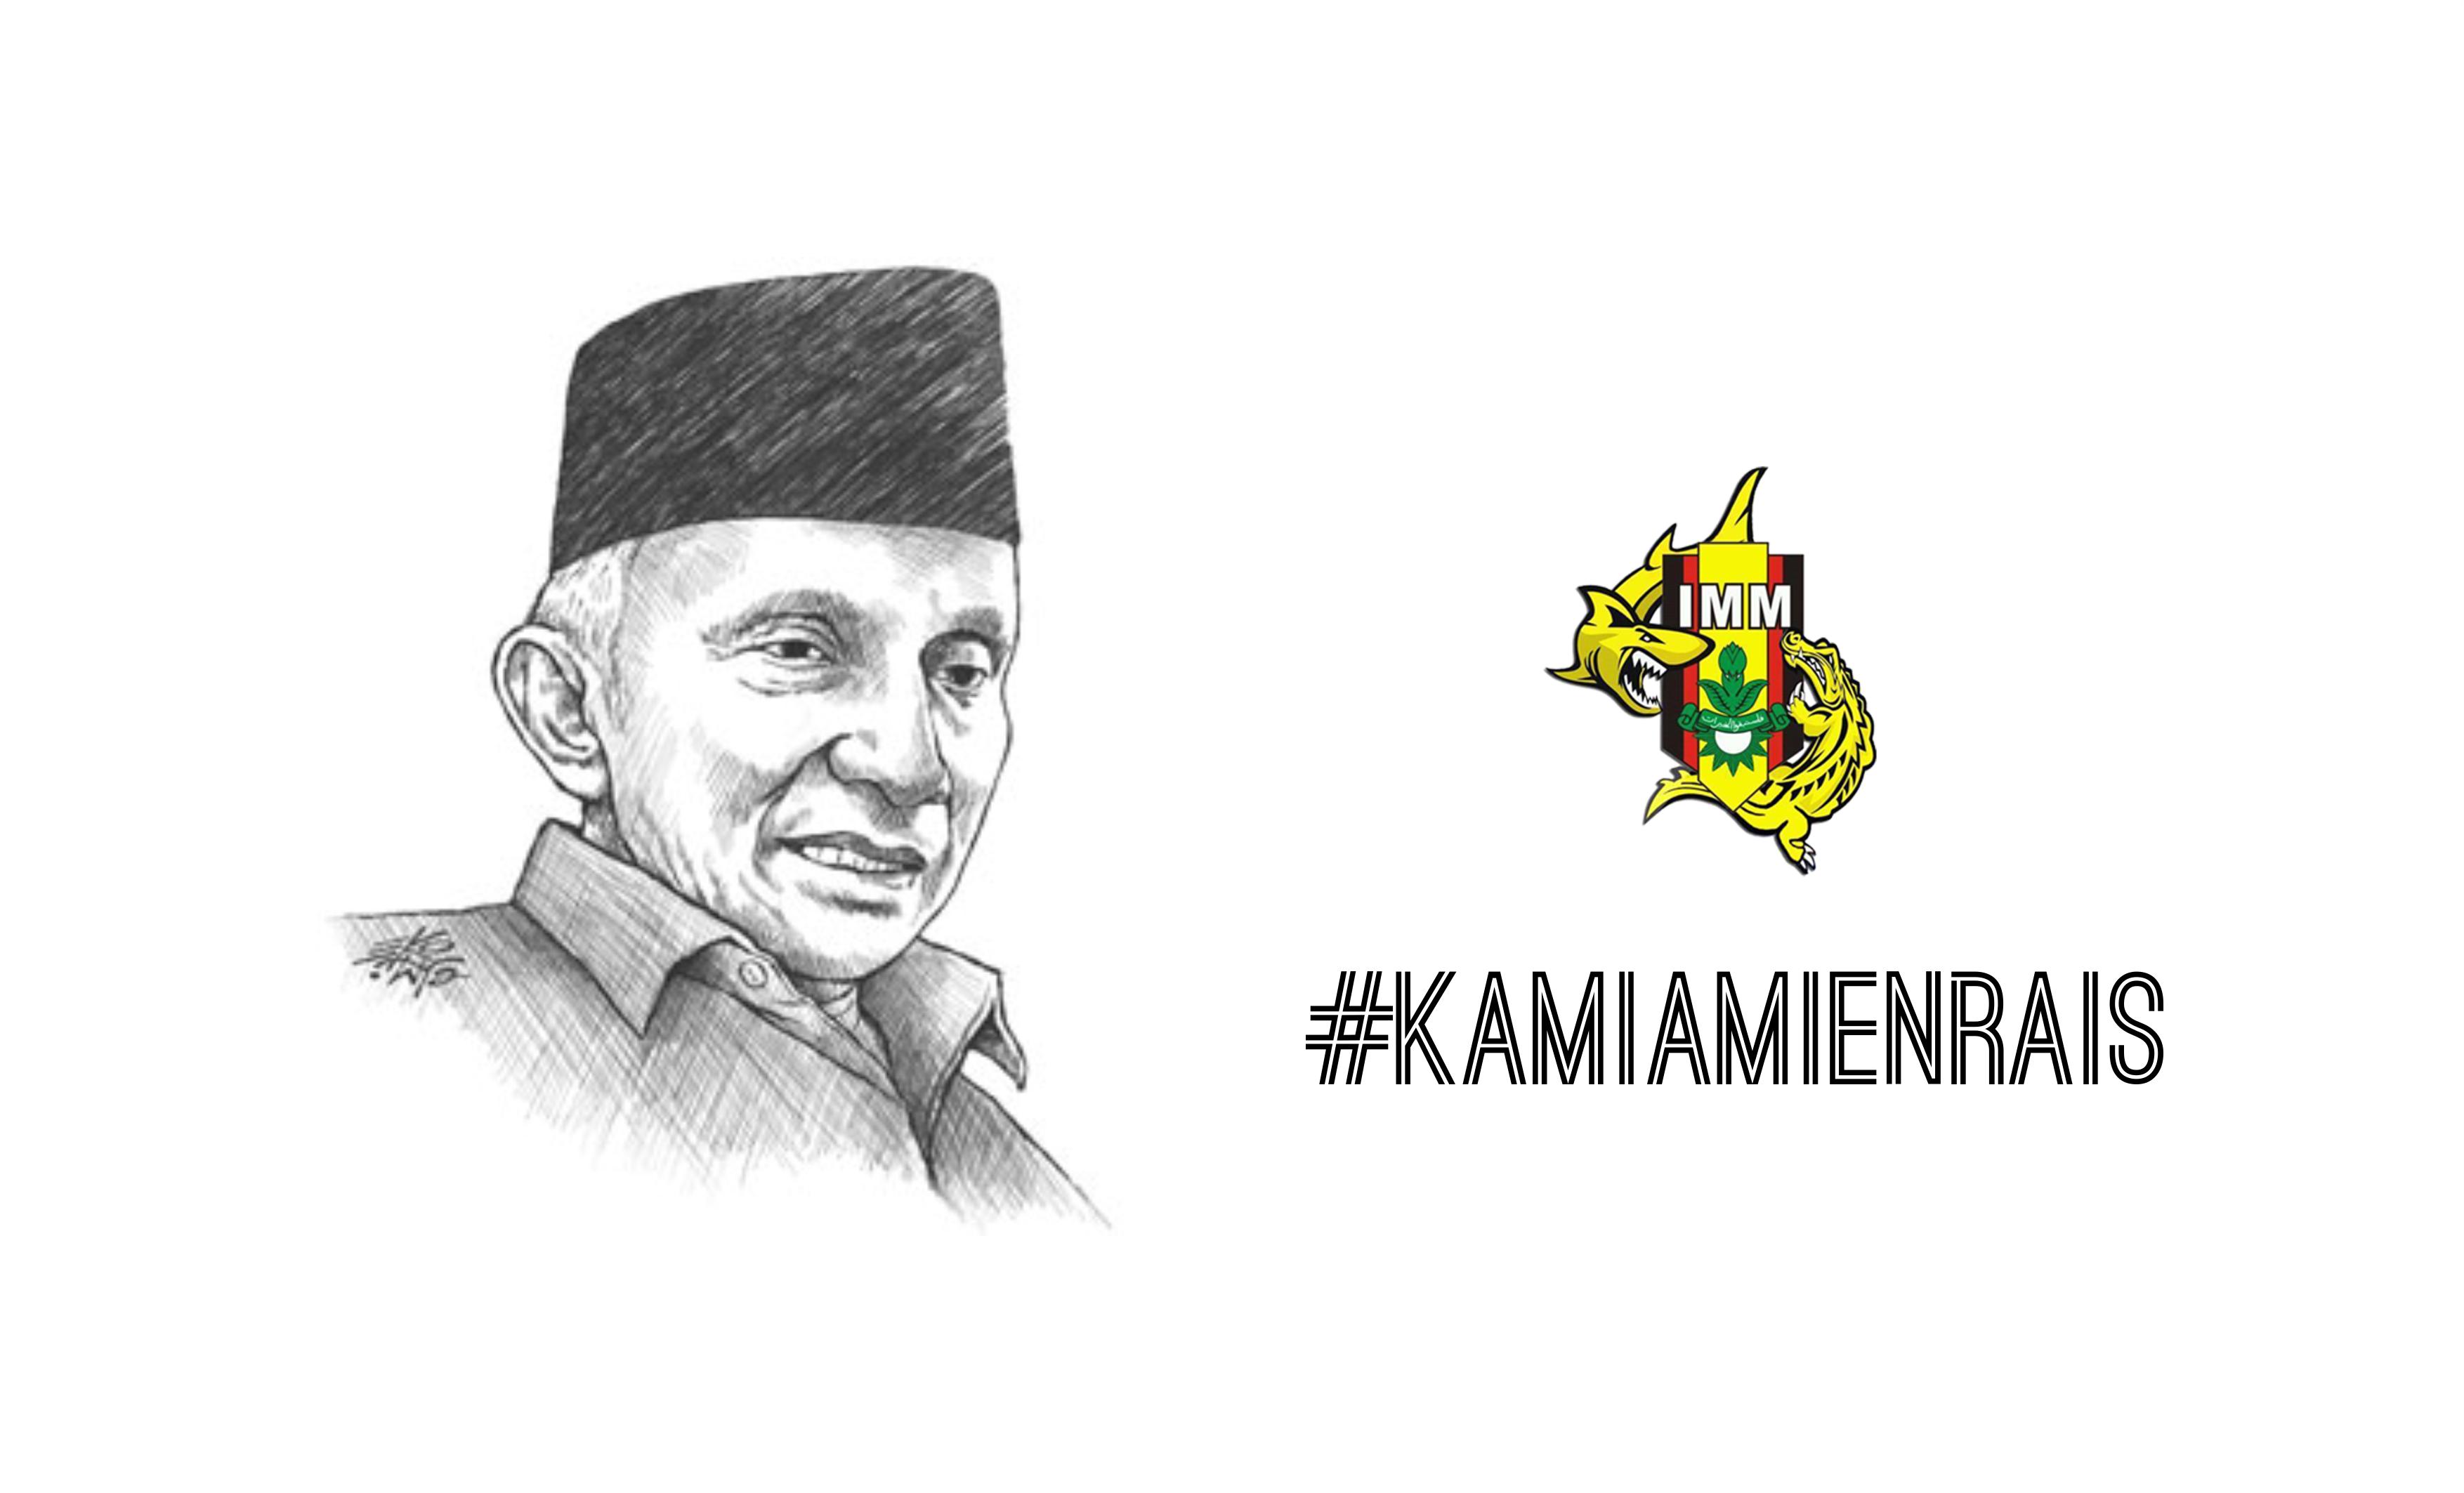 Pernyataan Sikap PC IMM Kota Surabaya atas Tuduhan Korupsi Kasus Dana Alat Kesehatan terhadap Amien Rais